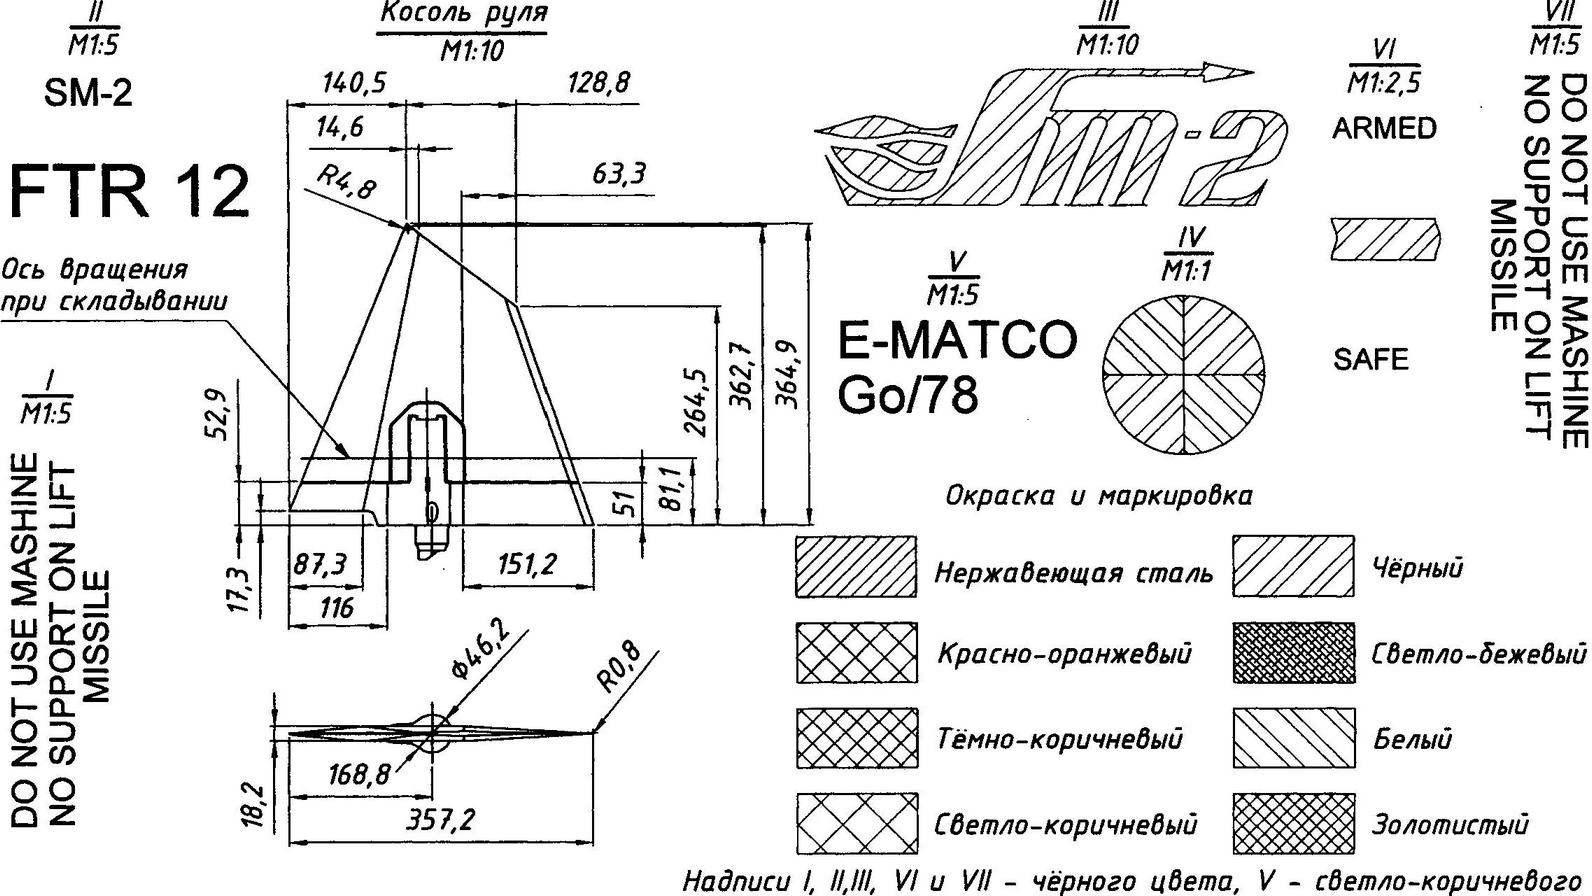 ЗУР «Standart-66C»